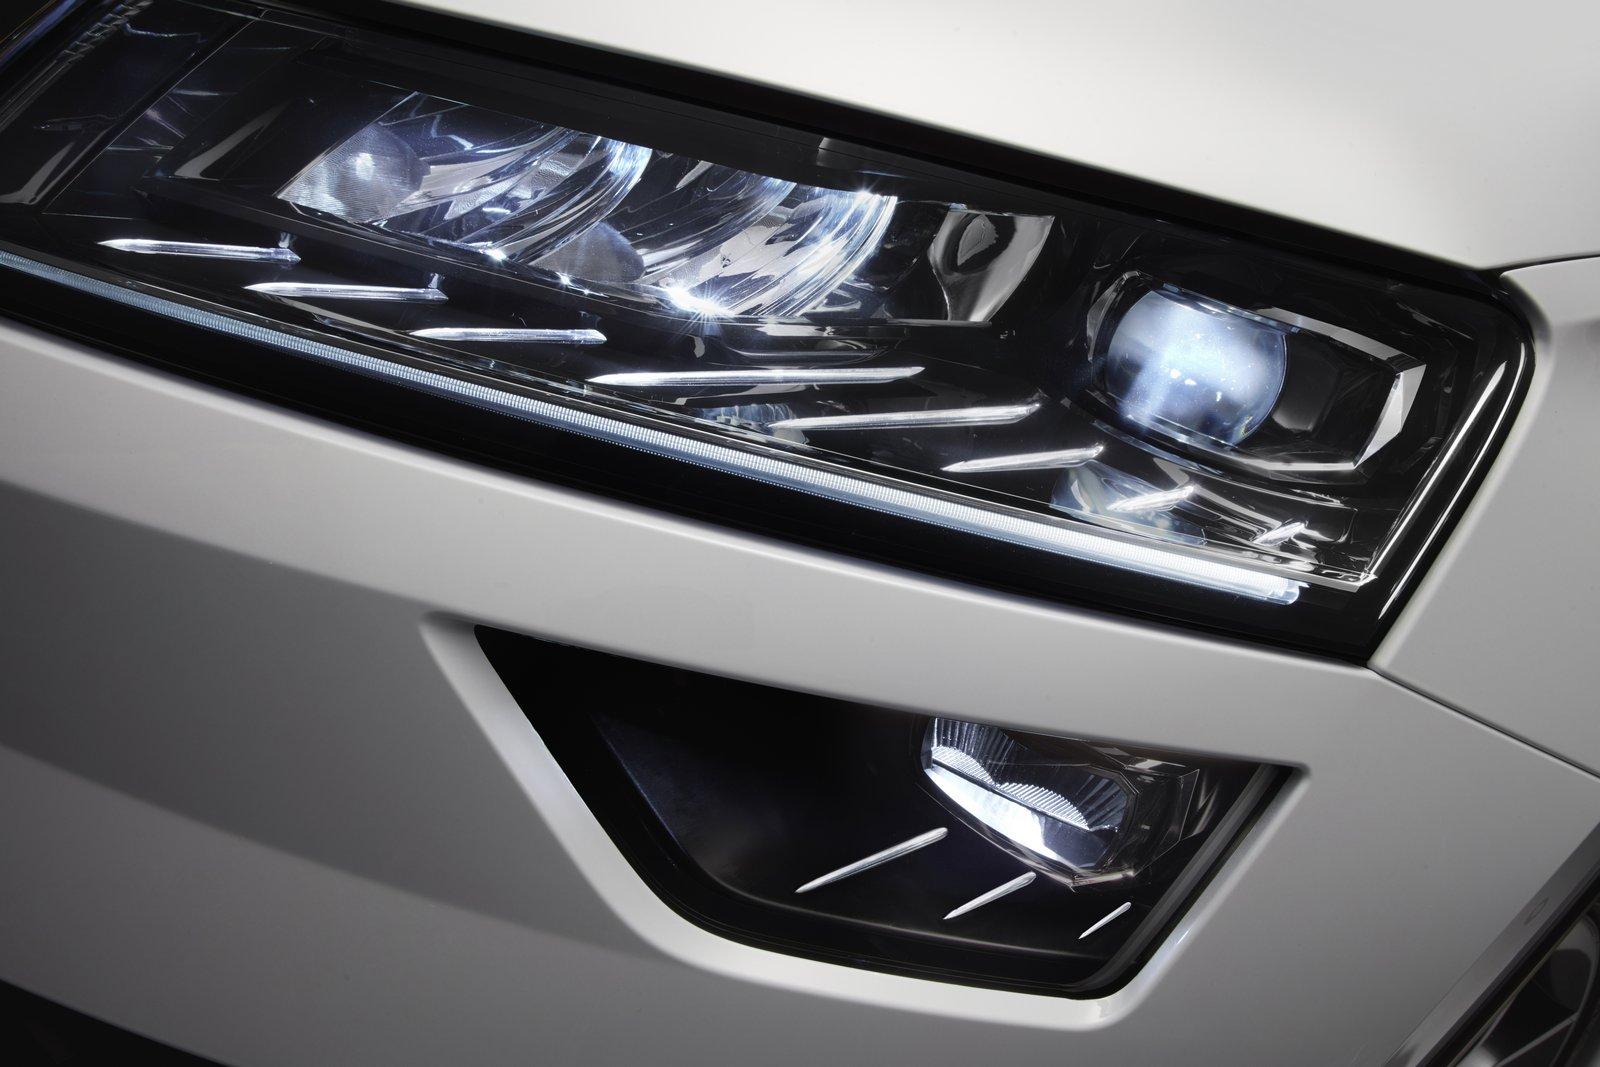 skoda-karoq-debuts-with-full-led-lights-15-tsi-and-digital-dashboard_7.jpg